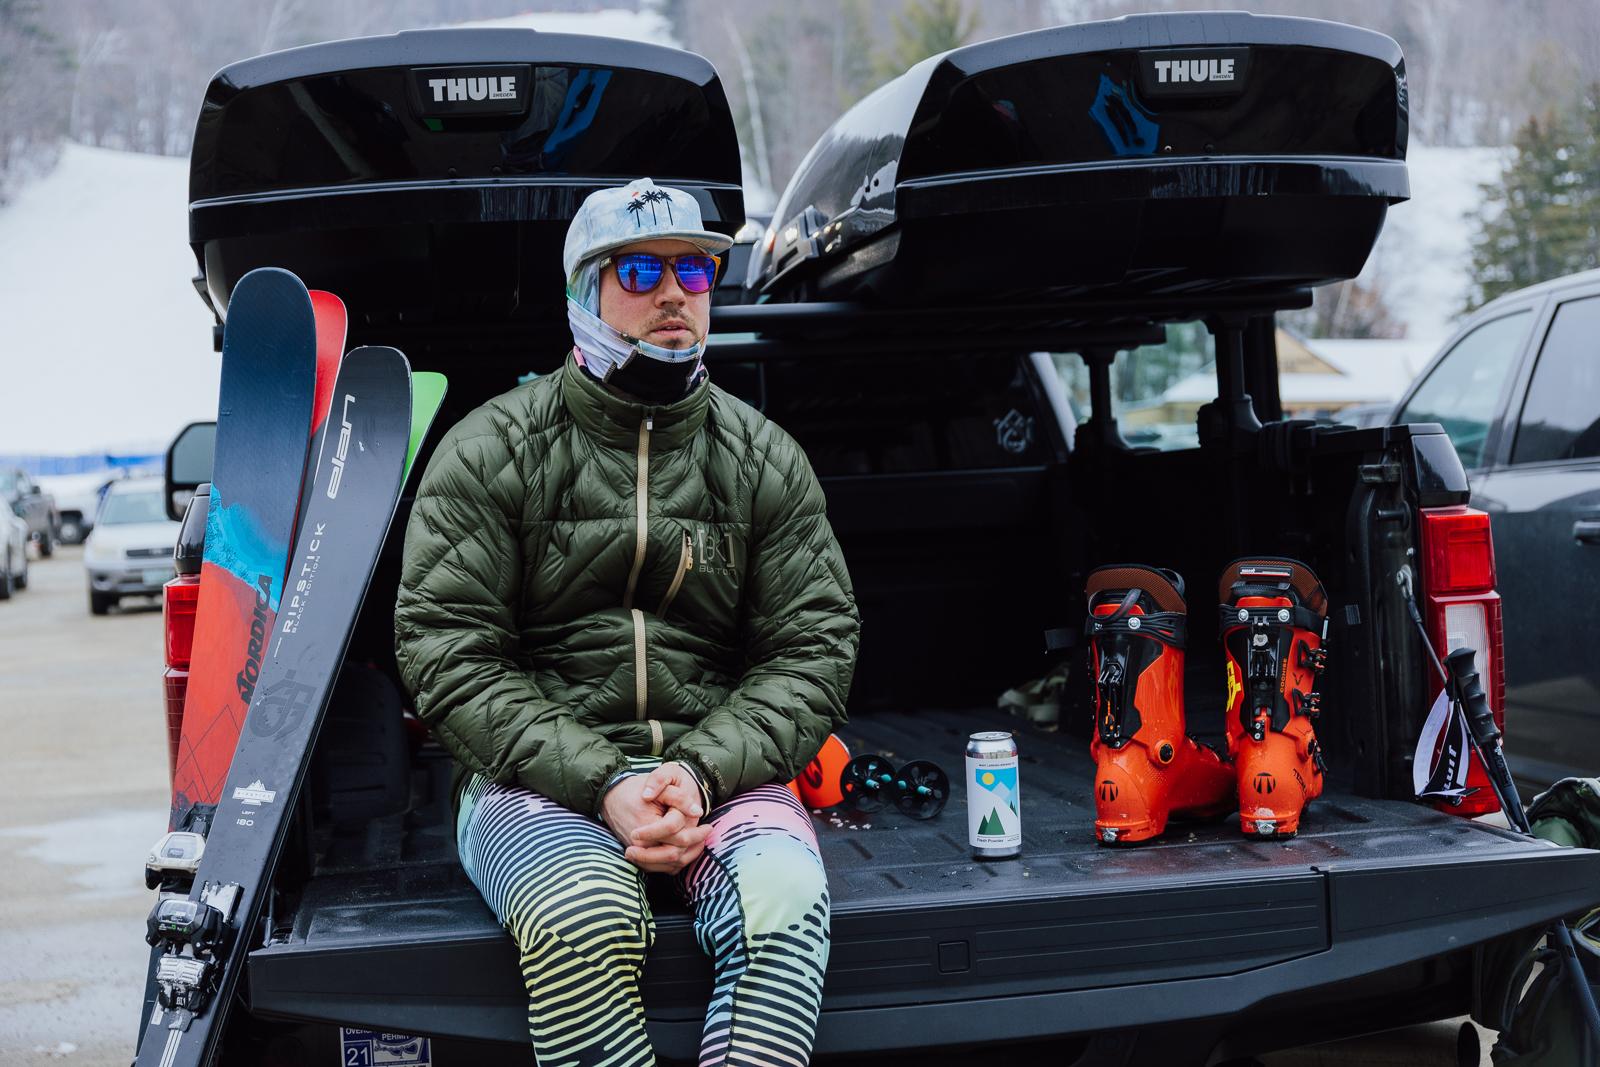 the ski monster, ski testing, ski test, blizzard skis, Nordica enforcer, elan ripstick, Volkl mantra, apres ski